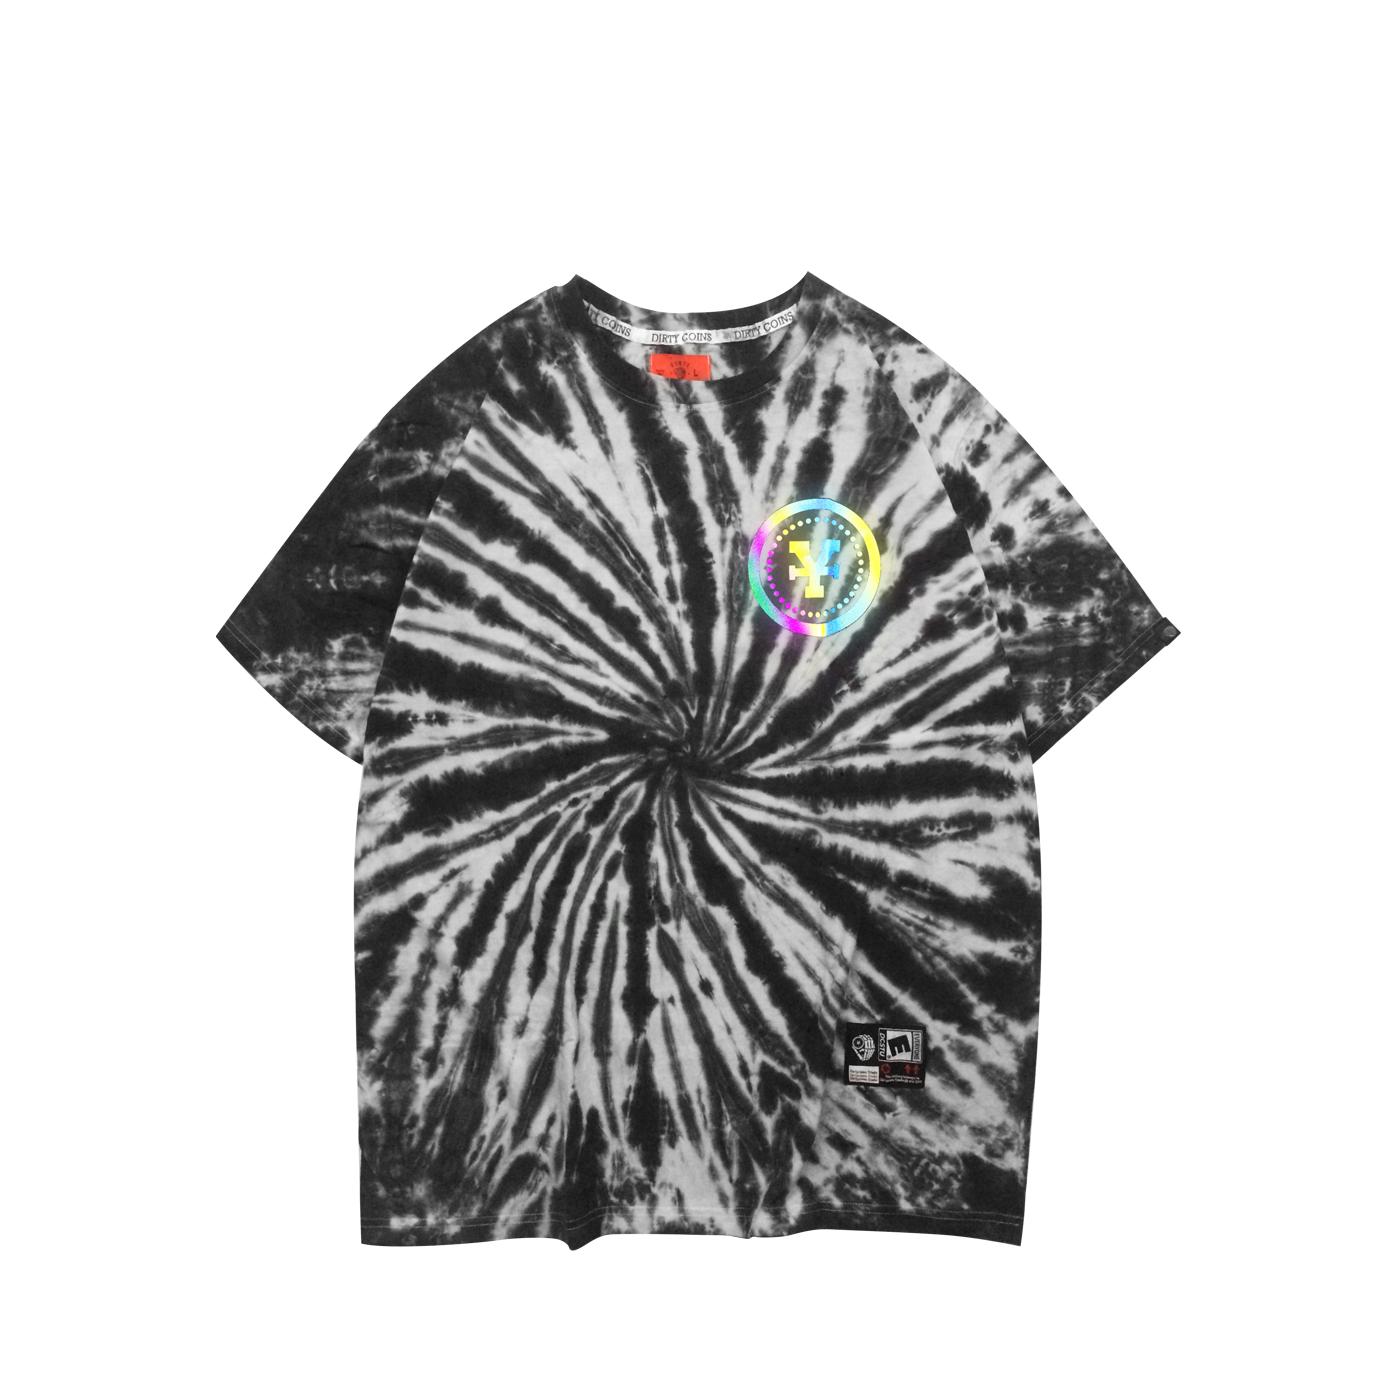 Hologram Venom Tie-Dye T-shirt